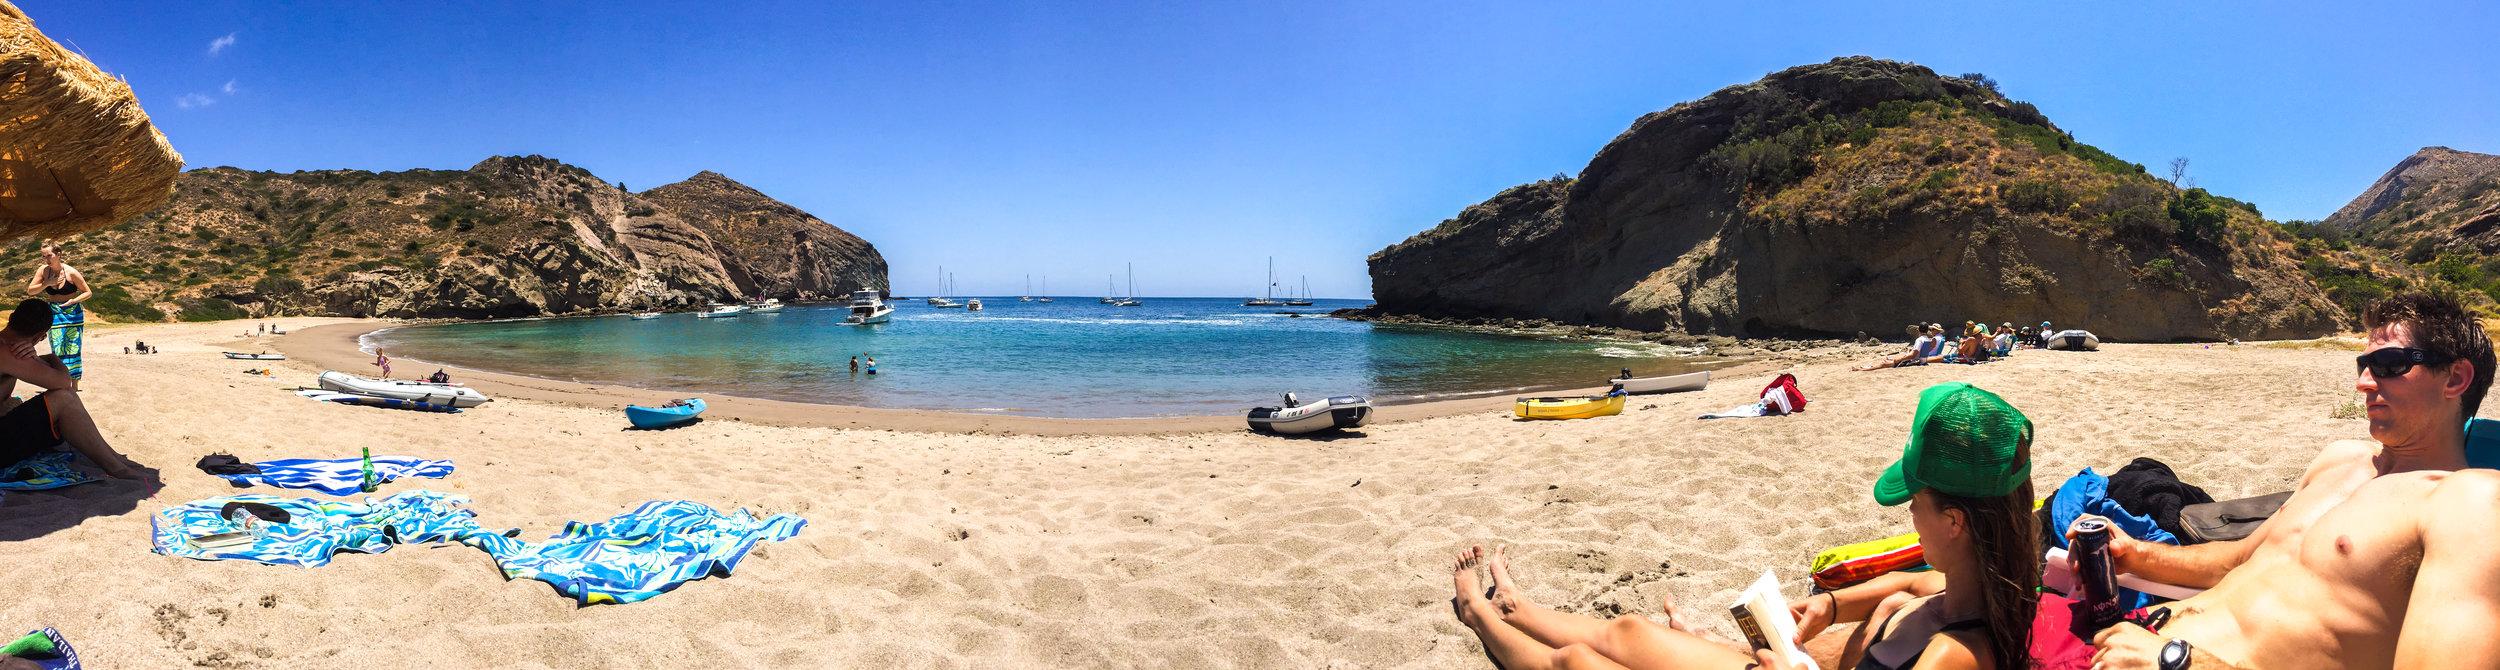 Best beach on the island.